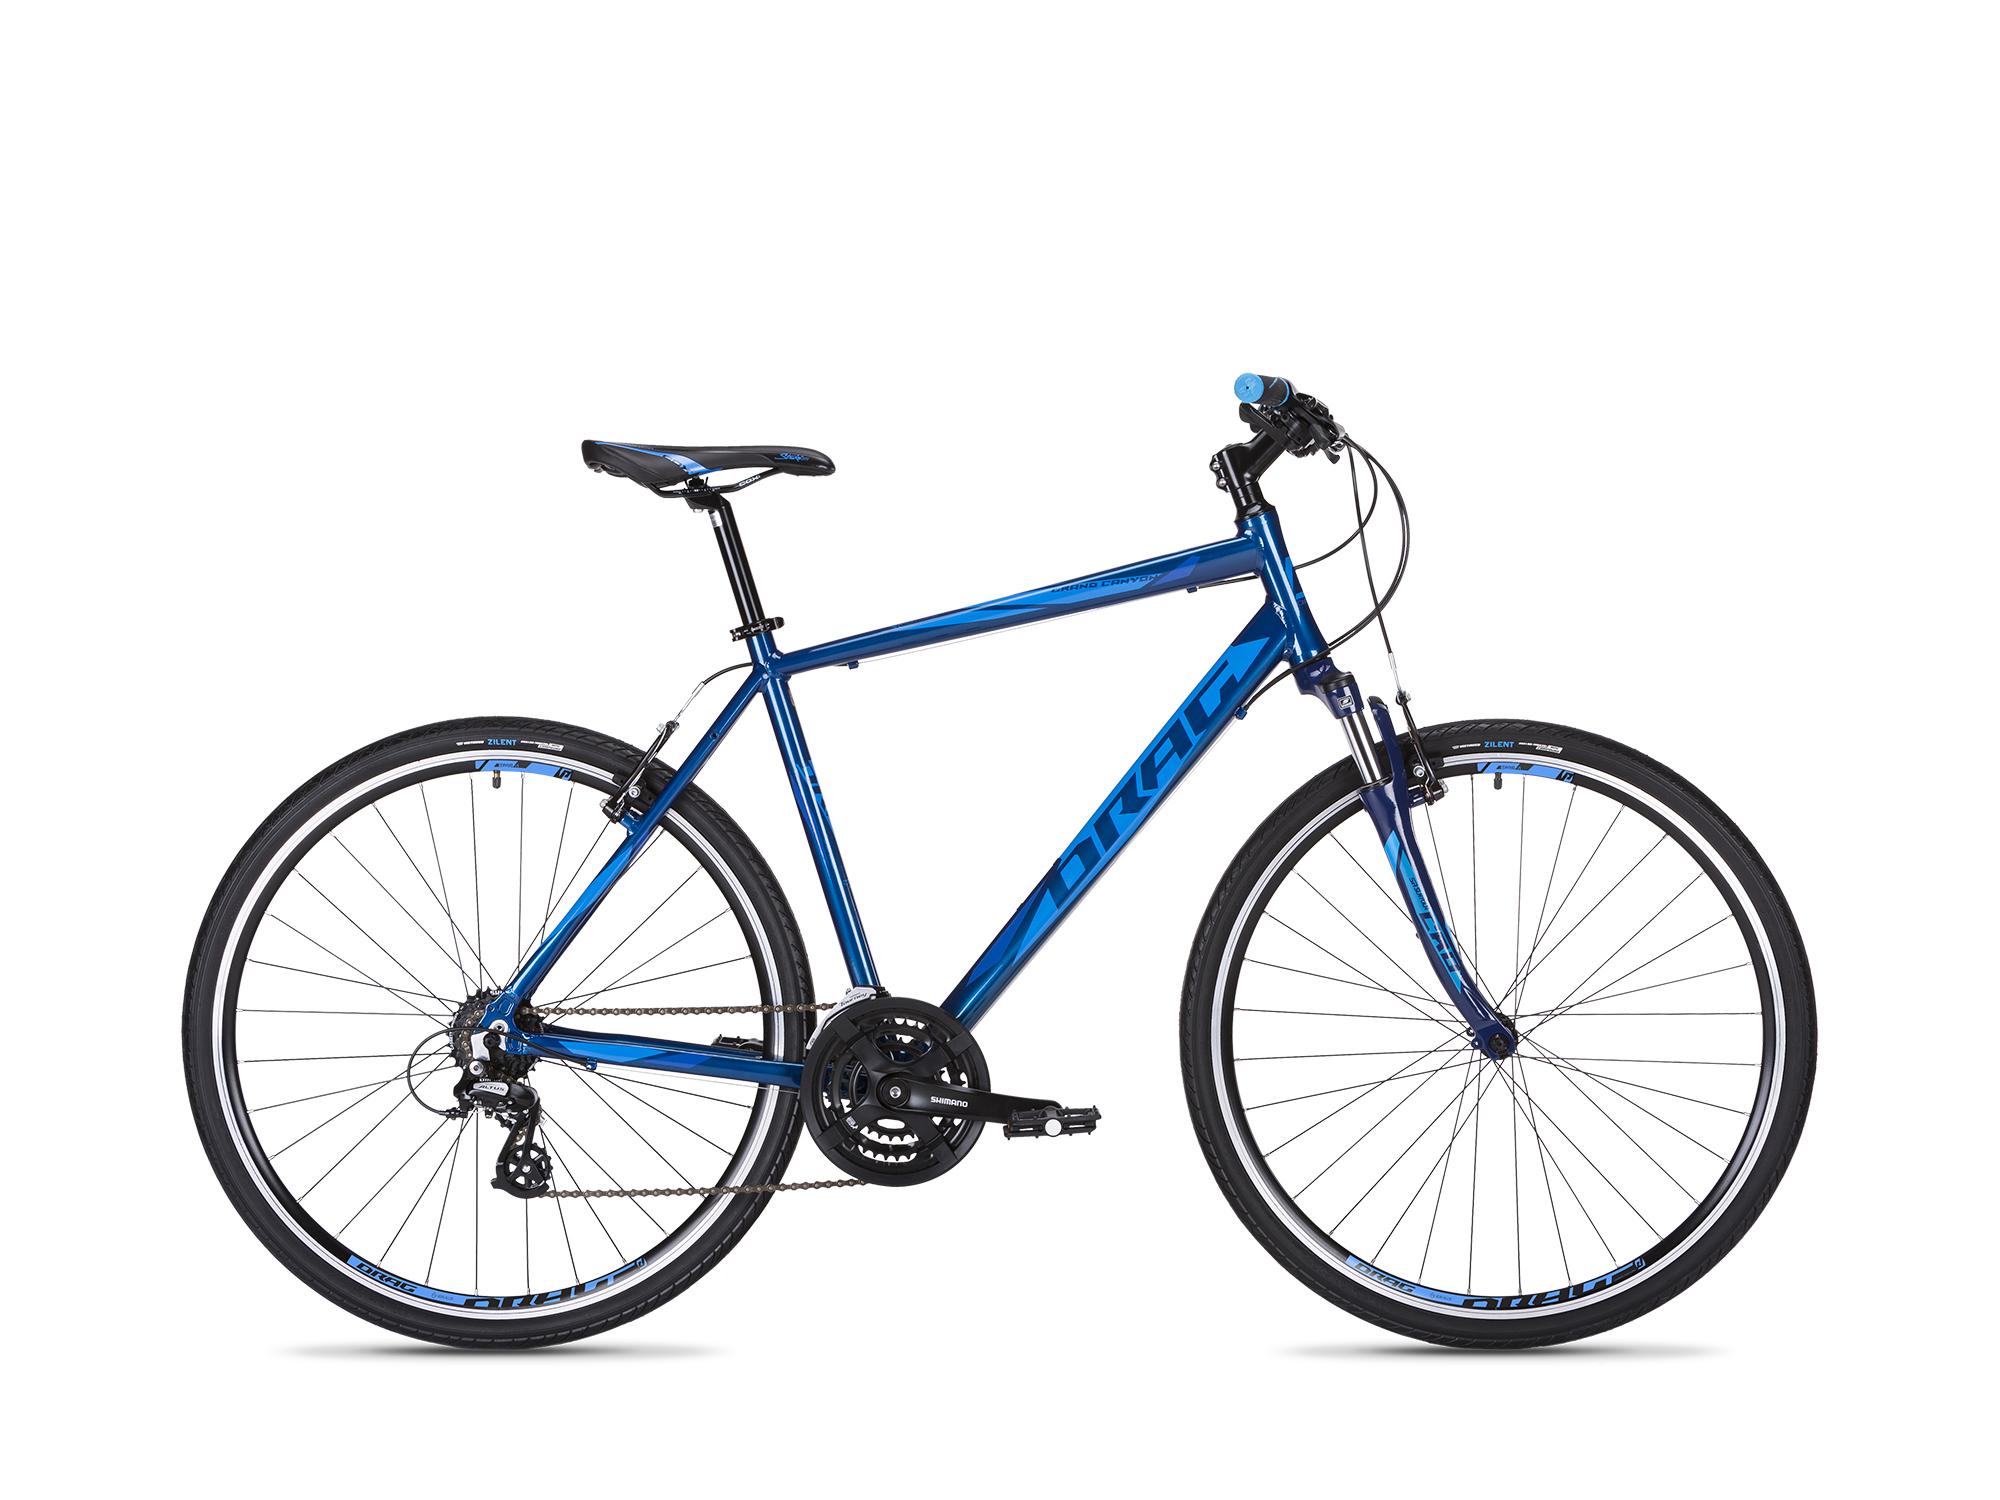 Grand Canyon Comp - DRAG Bicycles